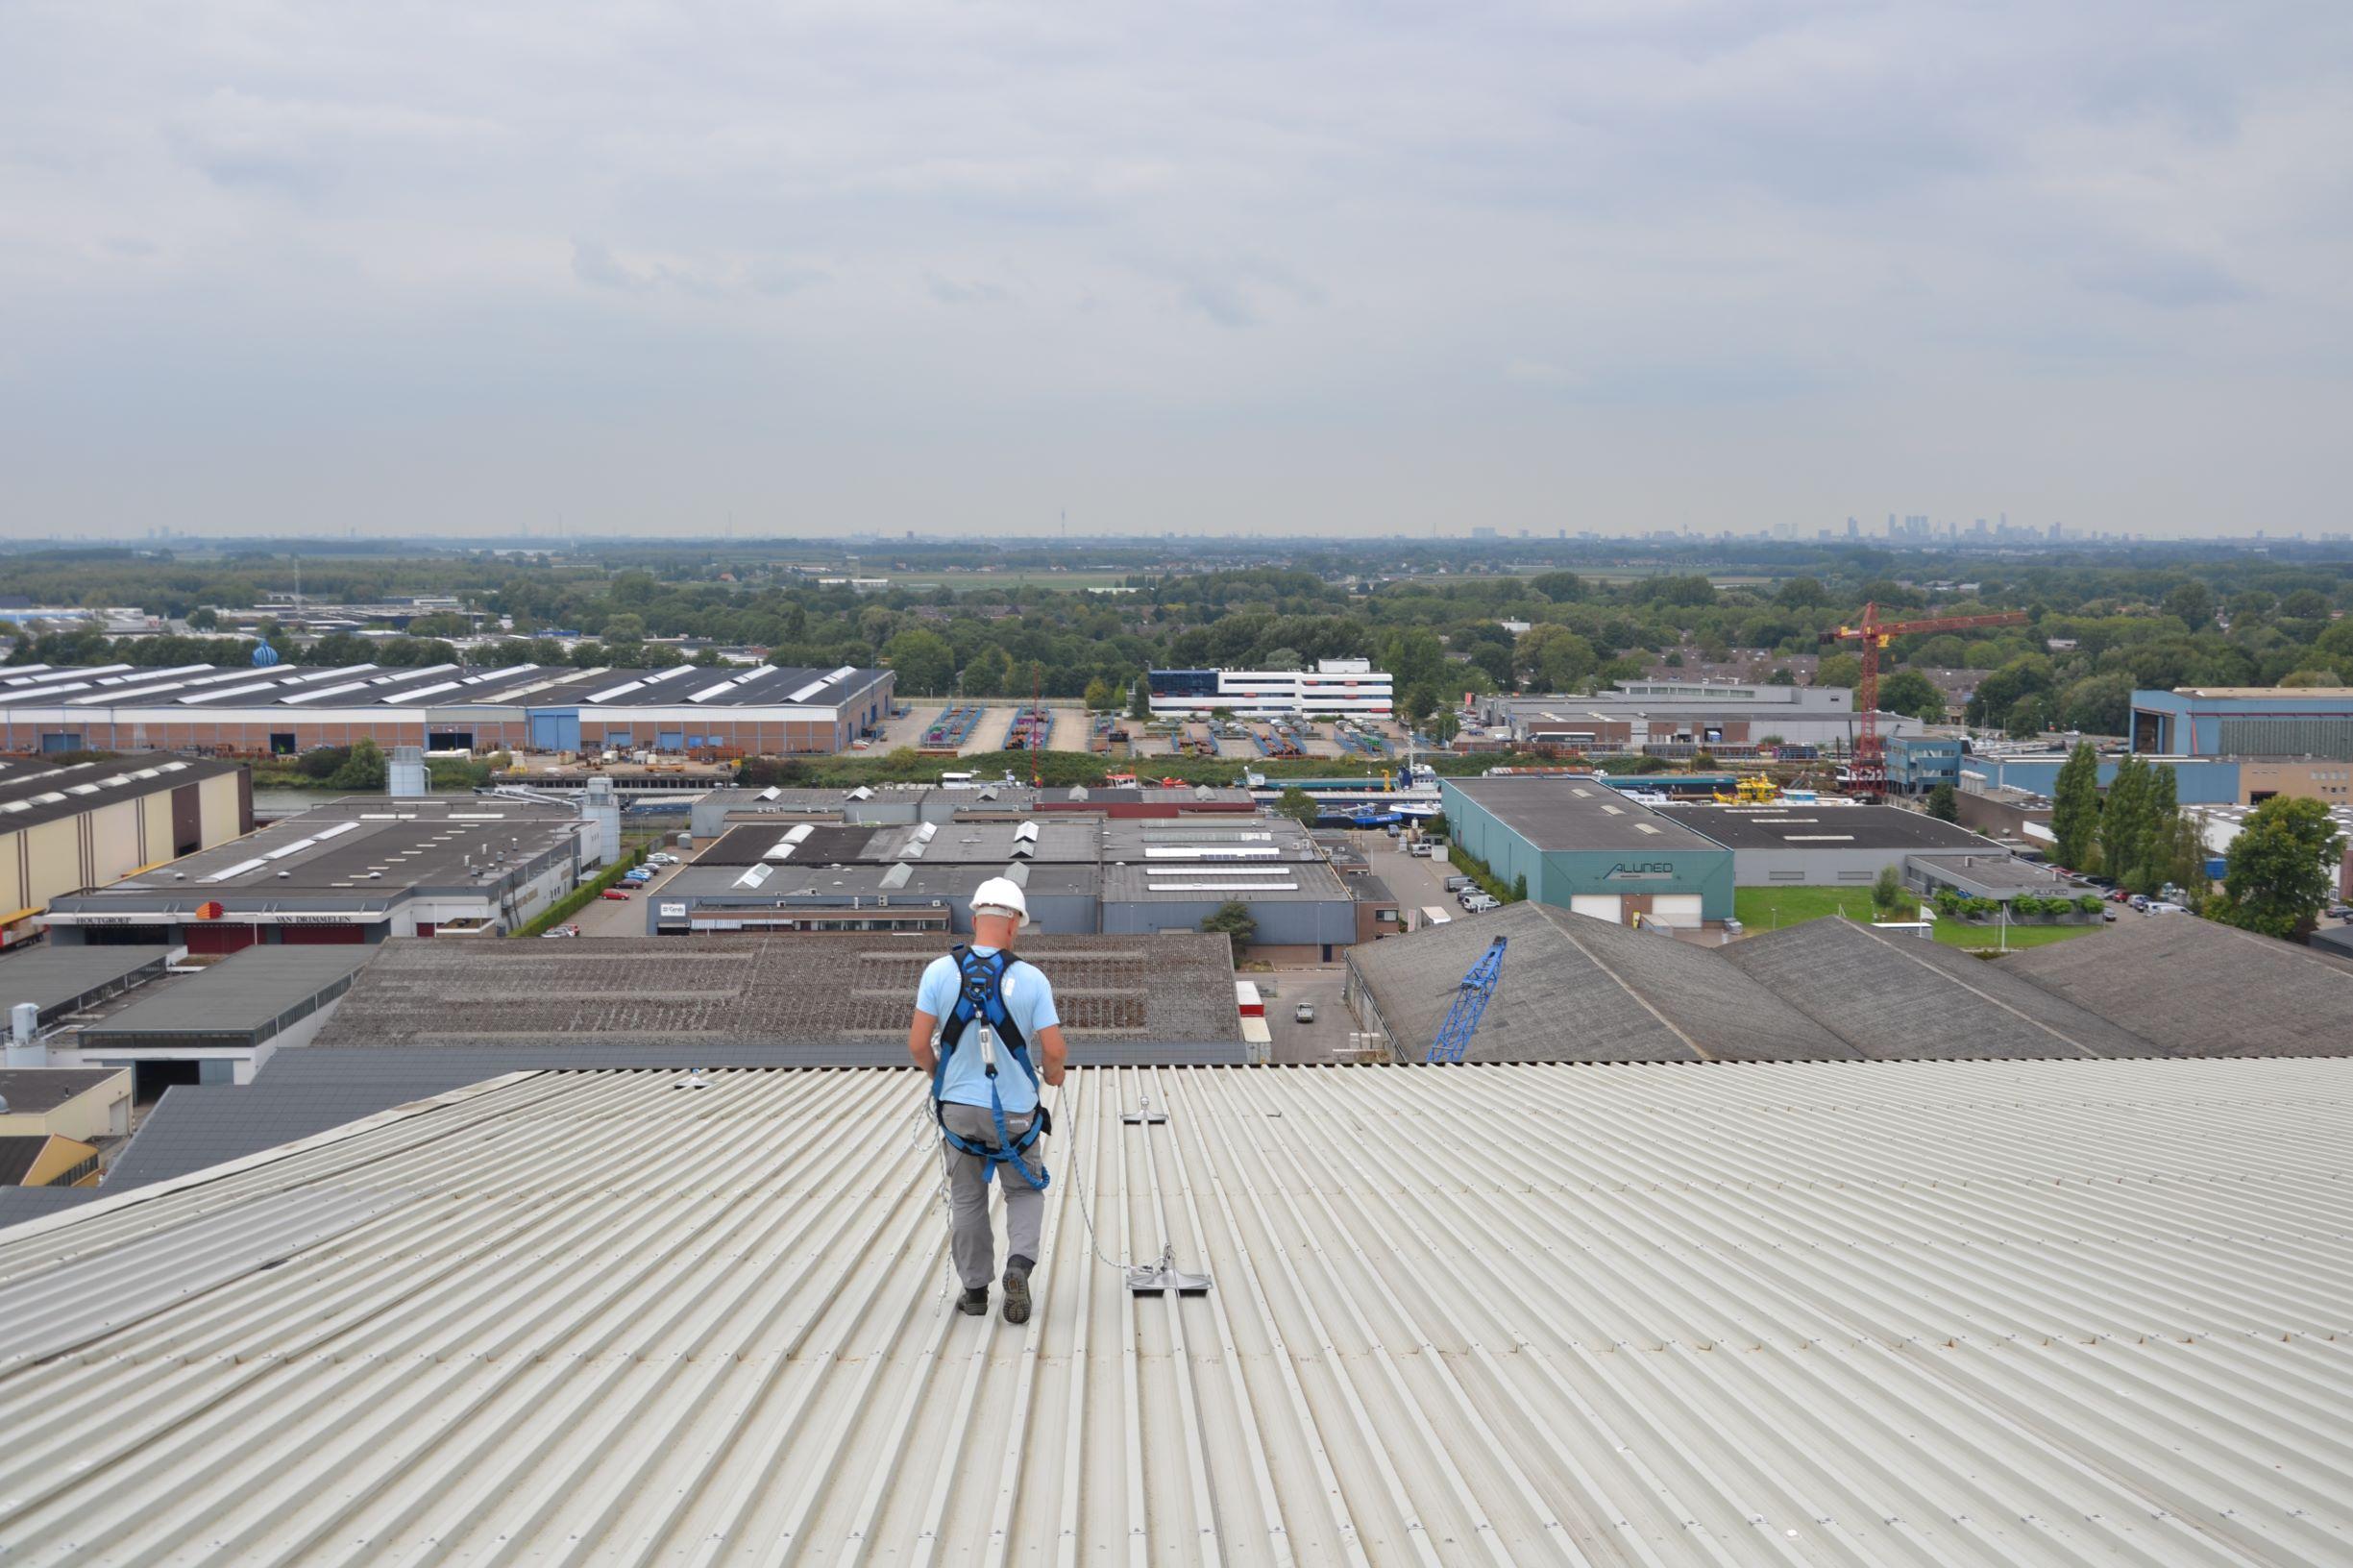 Persoon op metaal dak veilig aan valbeveiliging